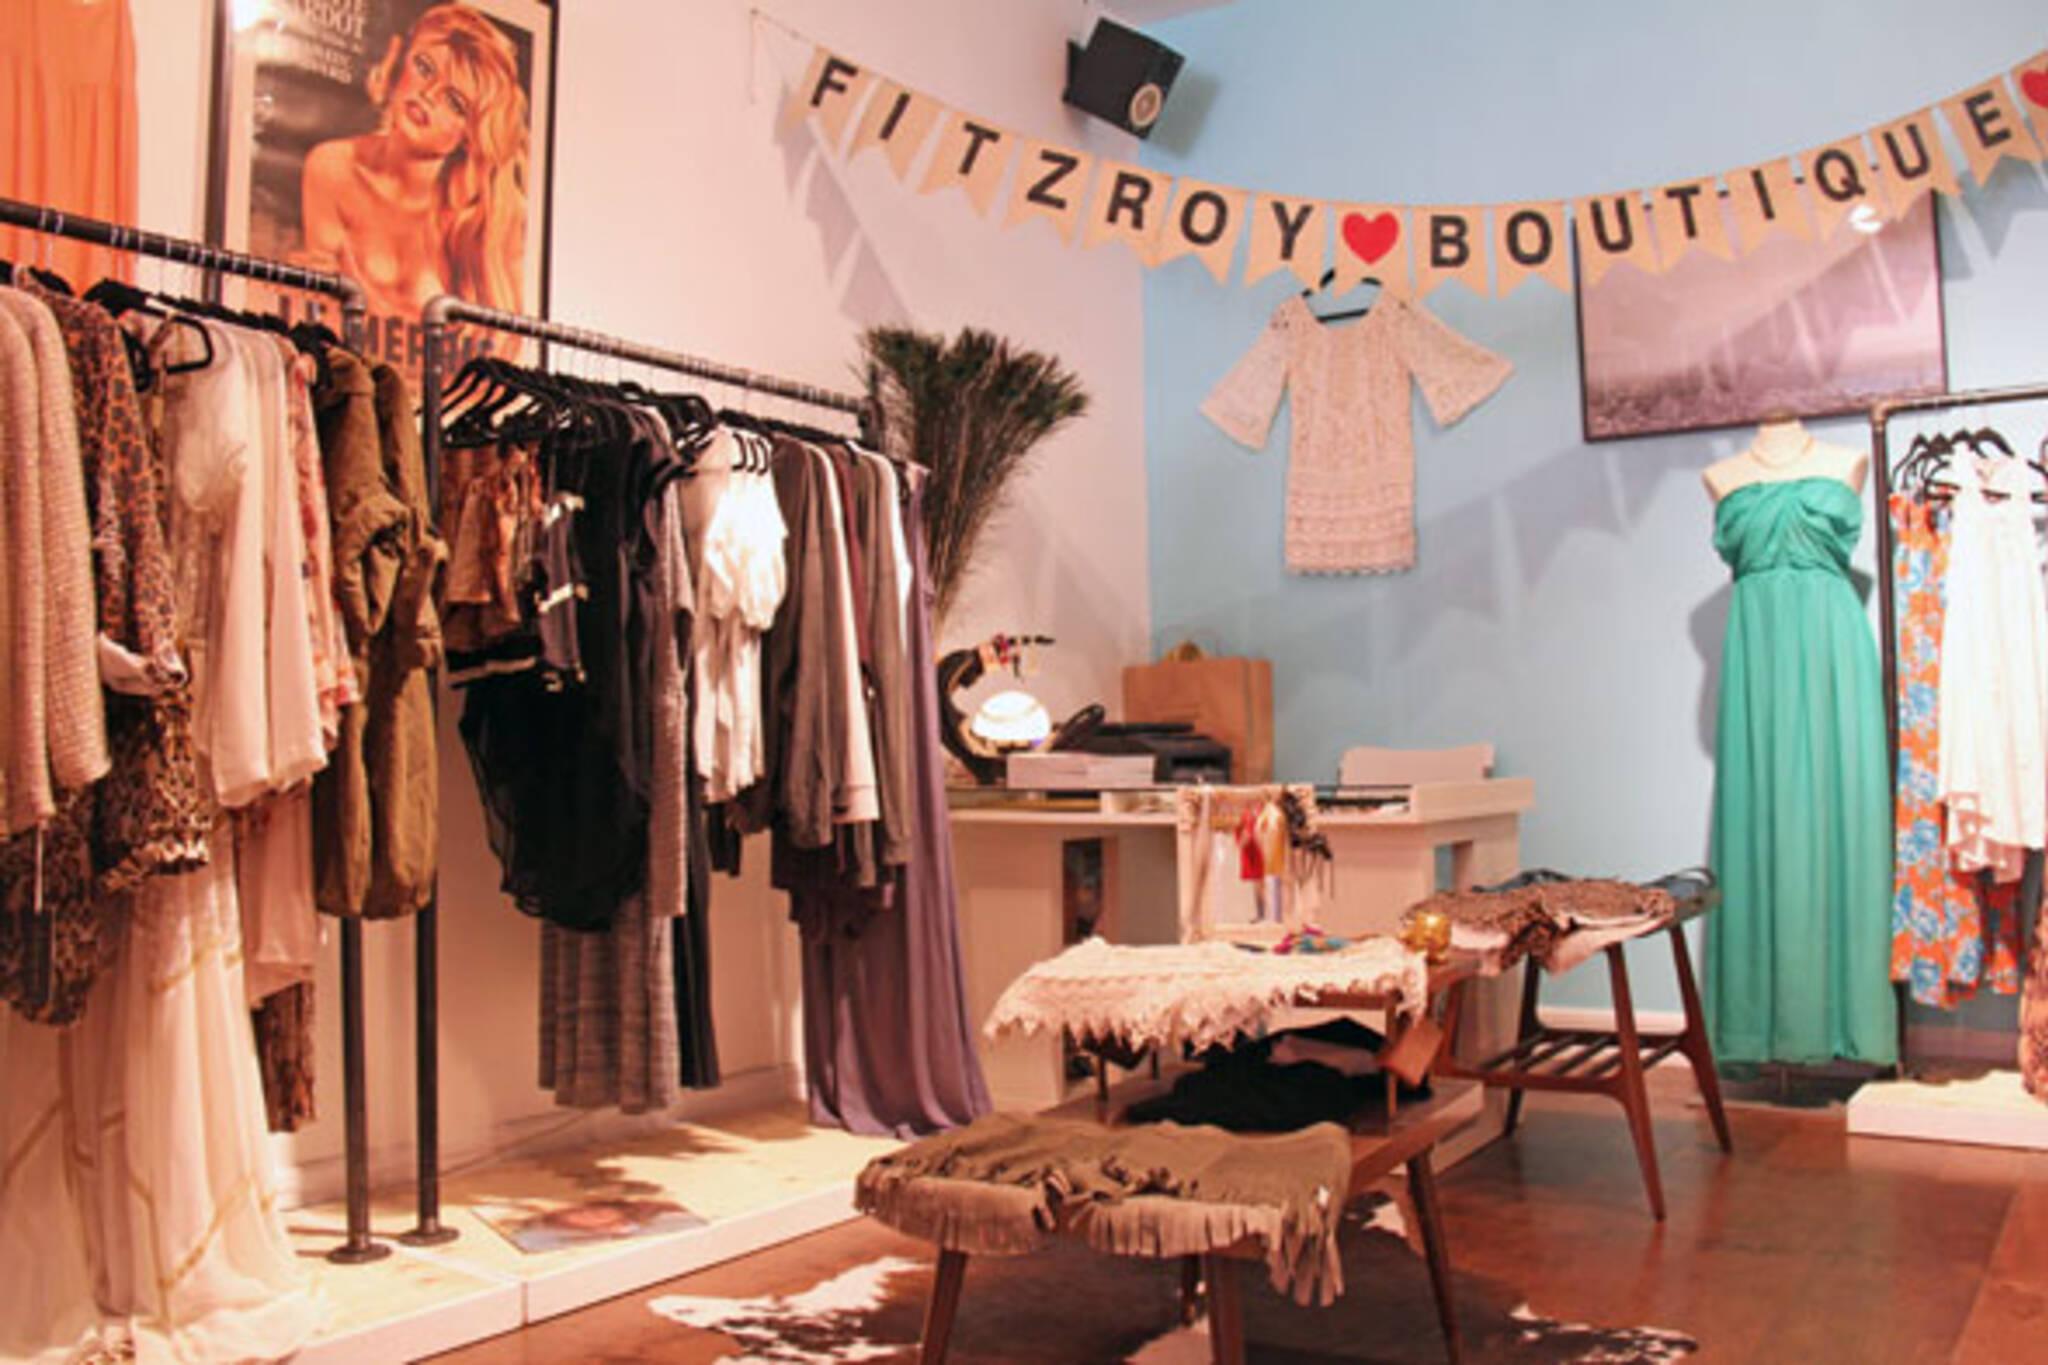 fitzroy boutique toronto